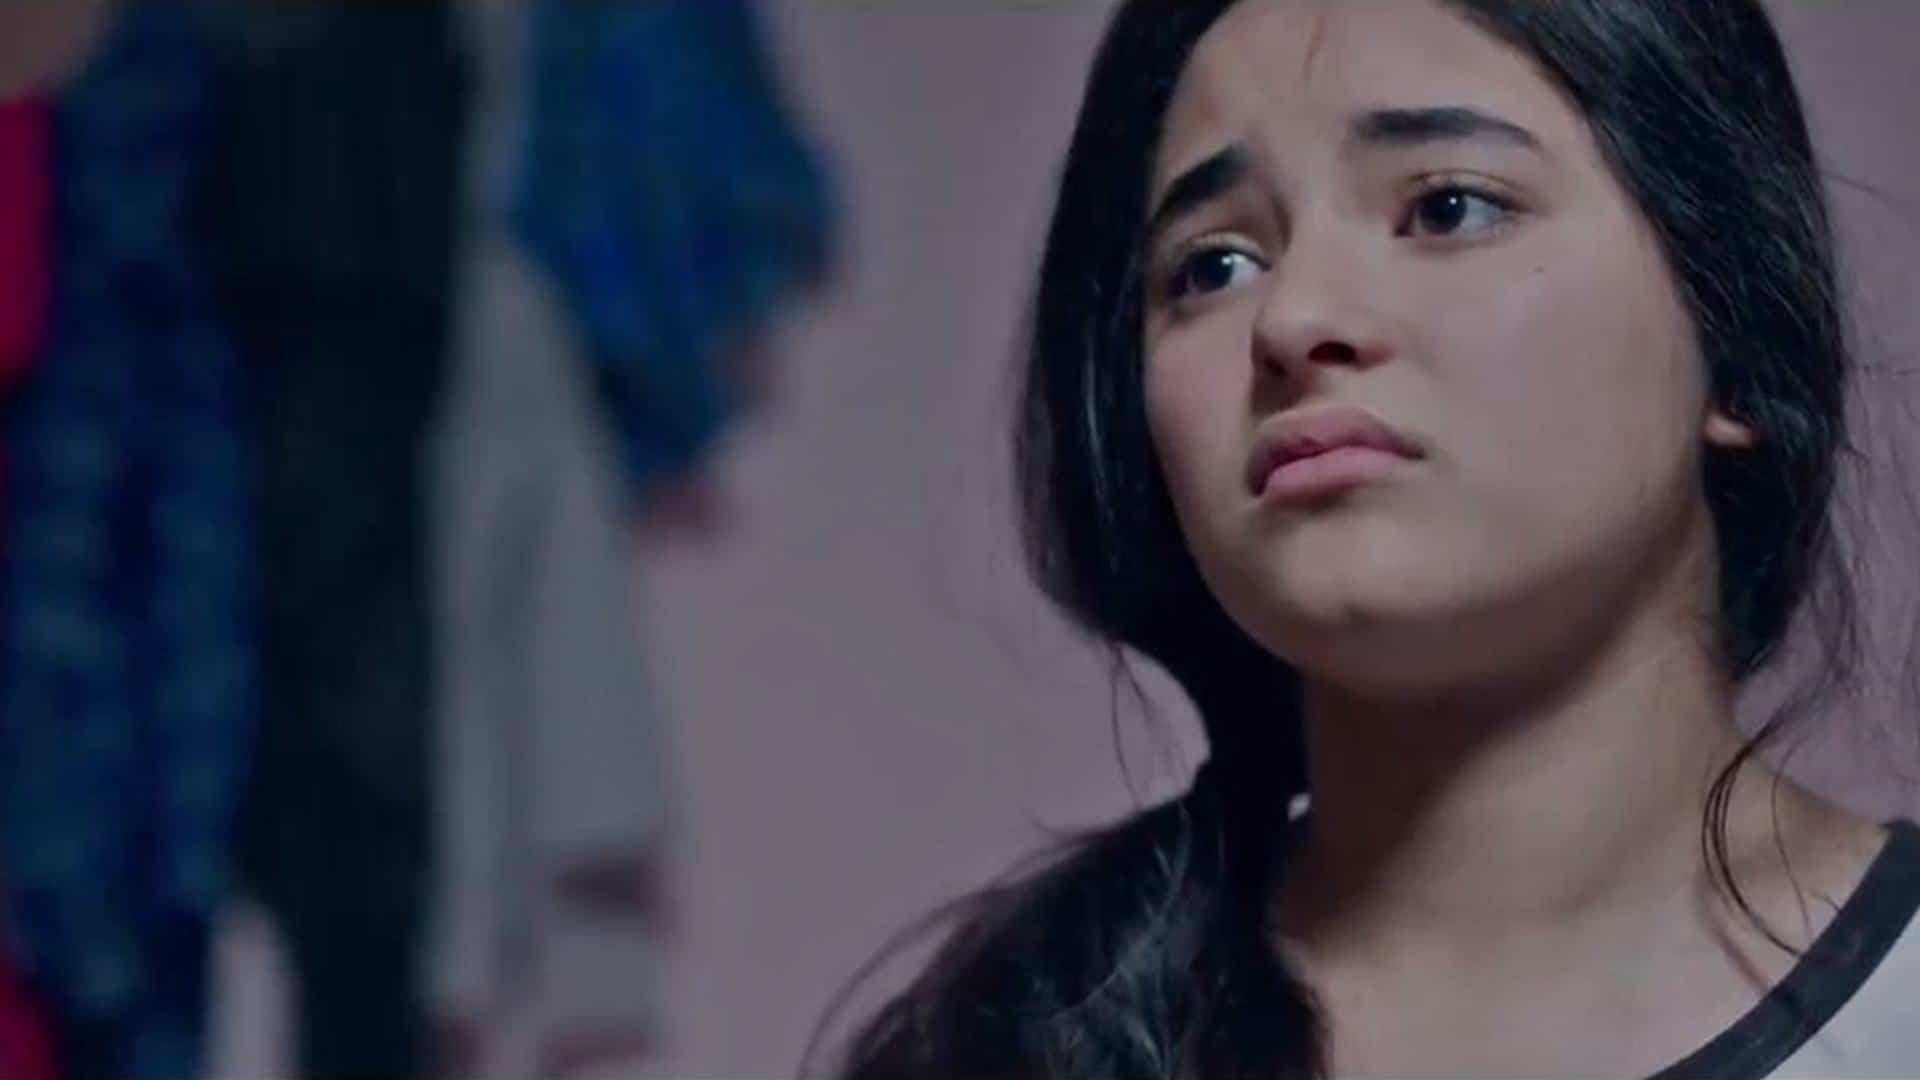 Dear India, Let Zaira Wasim Choose For Herself